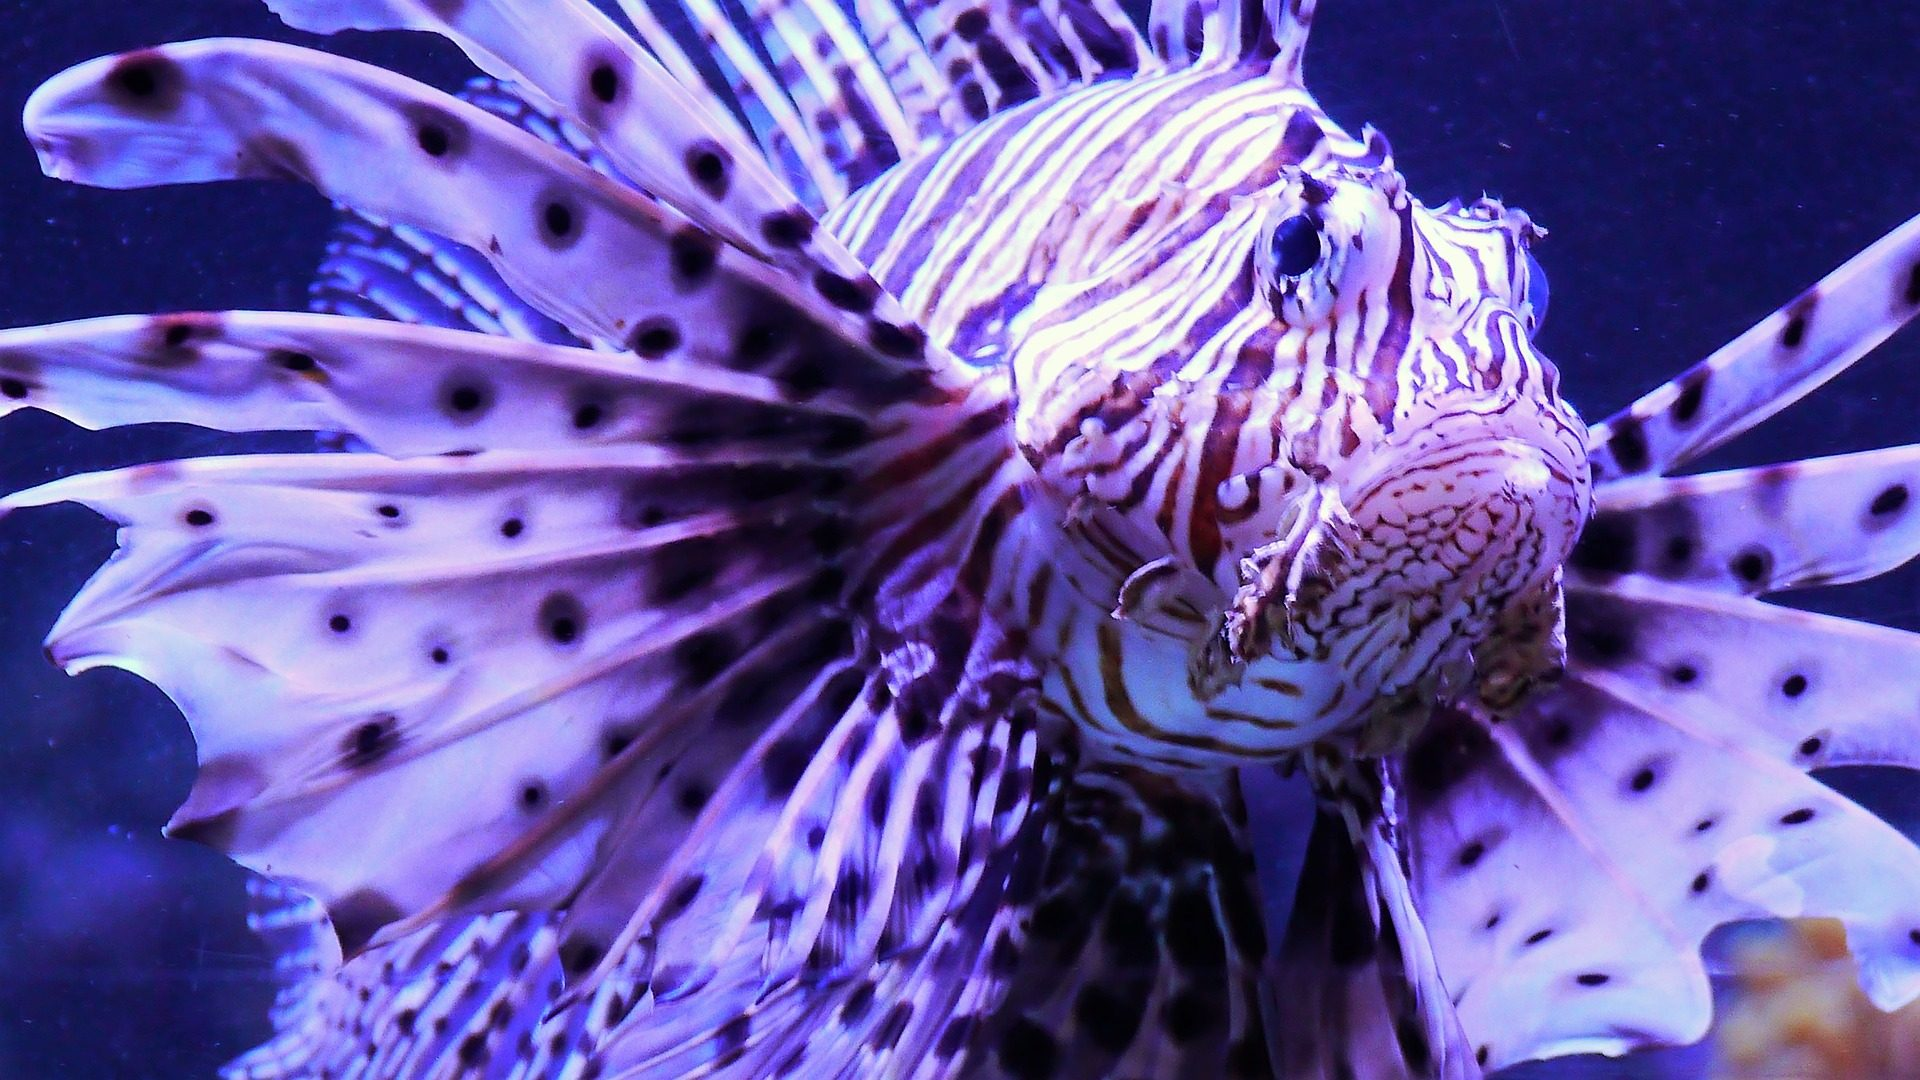 peixe, Leon, Aquário, tanque de peixes, perigoso, raro - Papéis de parede HD - Professor-falken.com